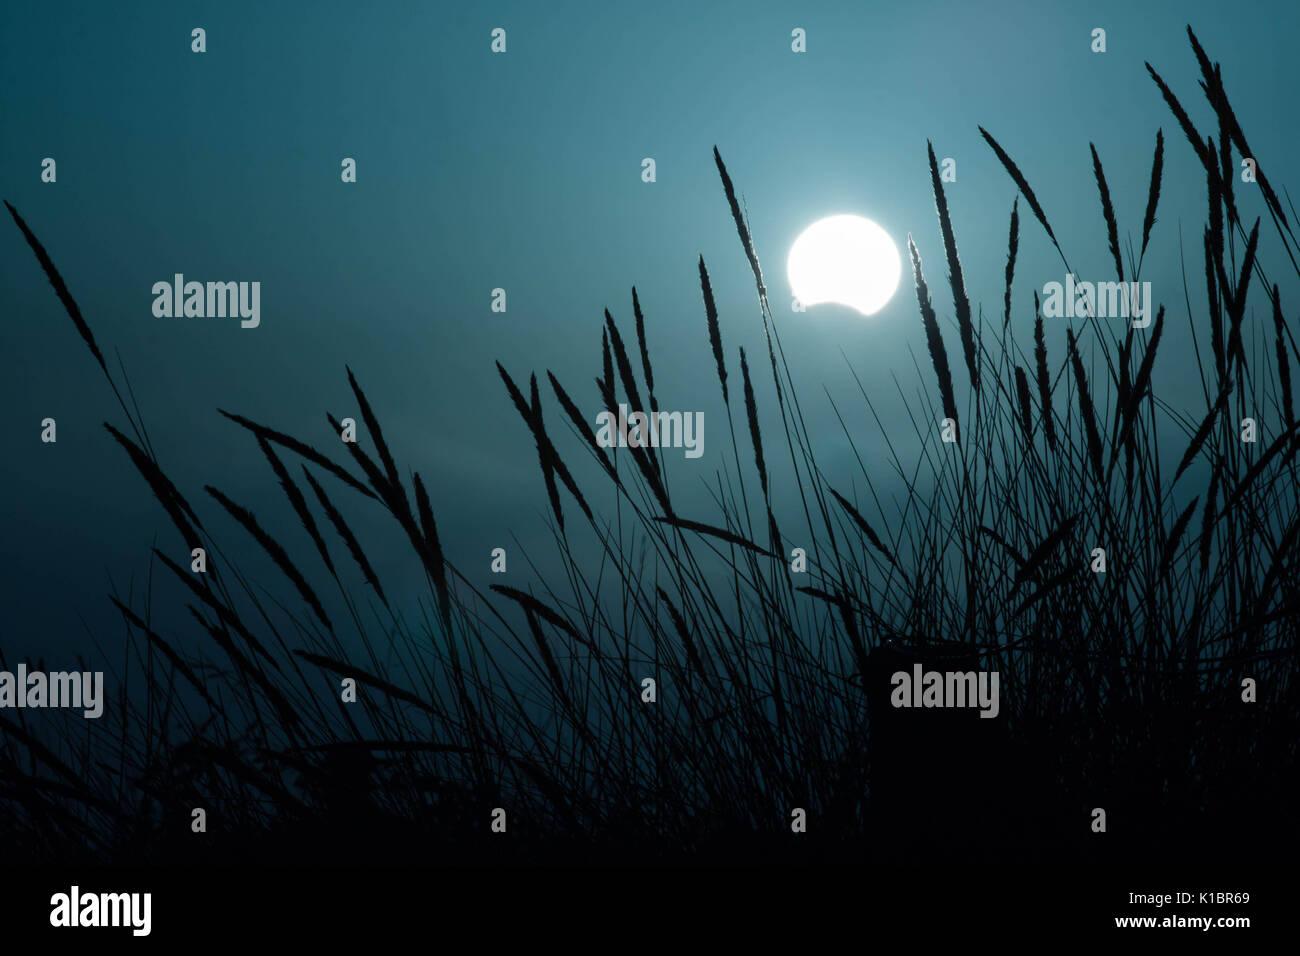 Partielle Sonnenfinsternis bei Sonnenuntergang mit Dunkelblauen Himmel Stockbild